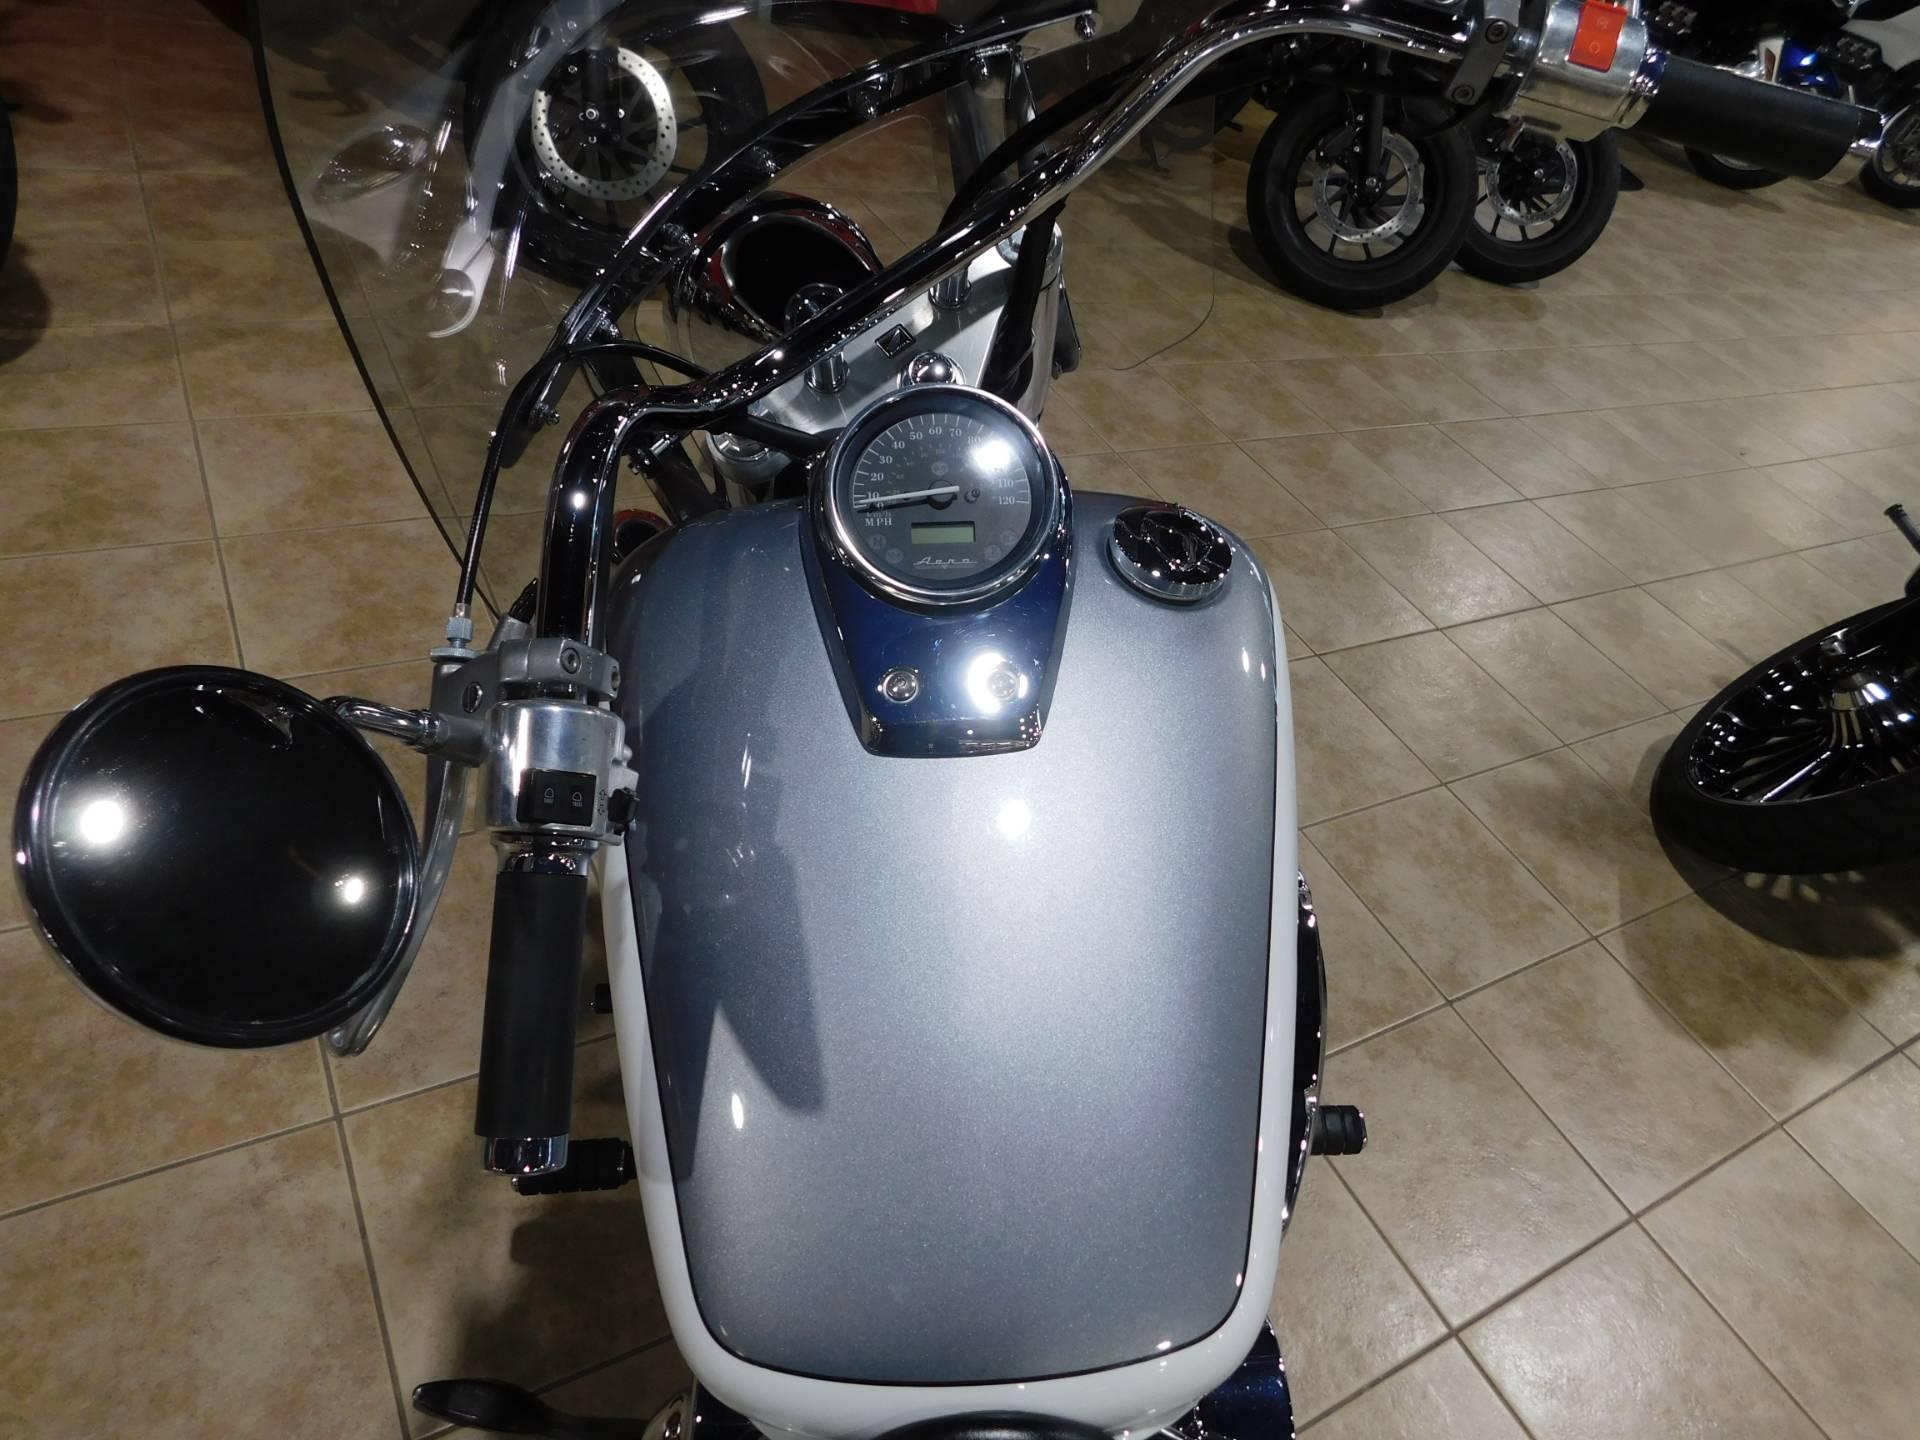 2005 Honda Shadow Aero® 750 in Kendallville, Indiana